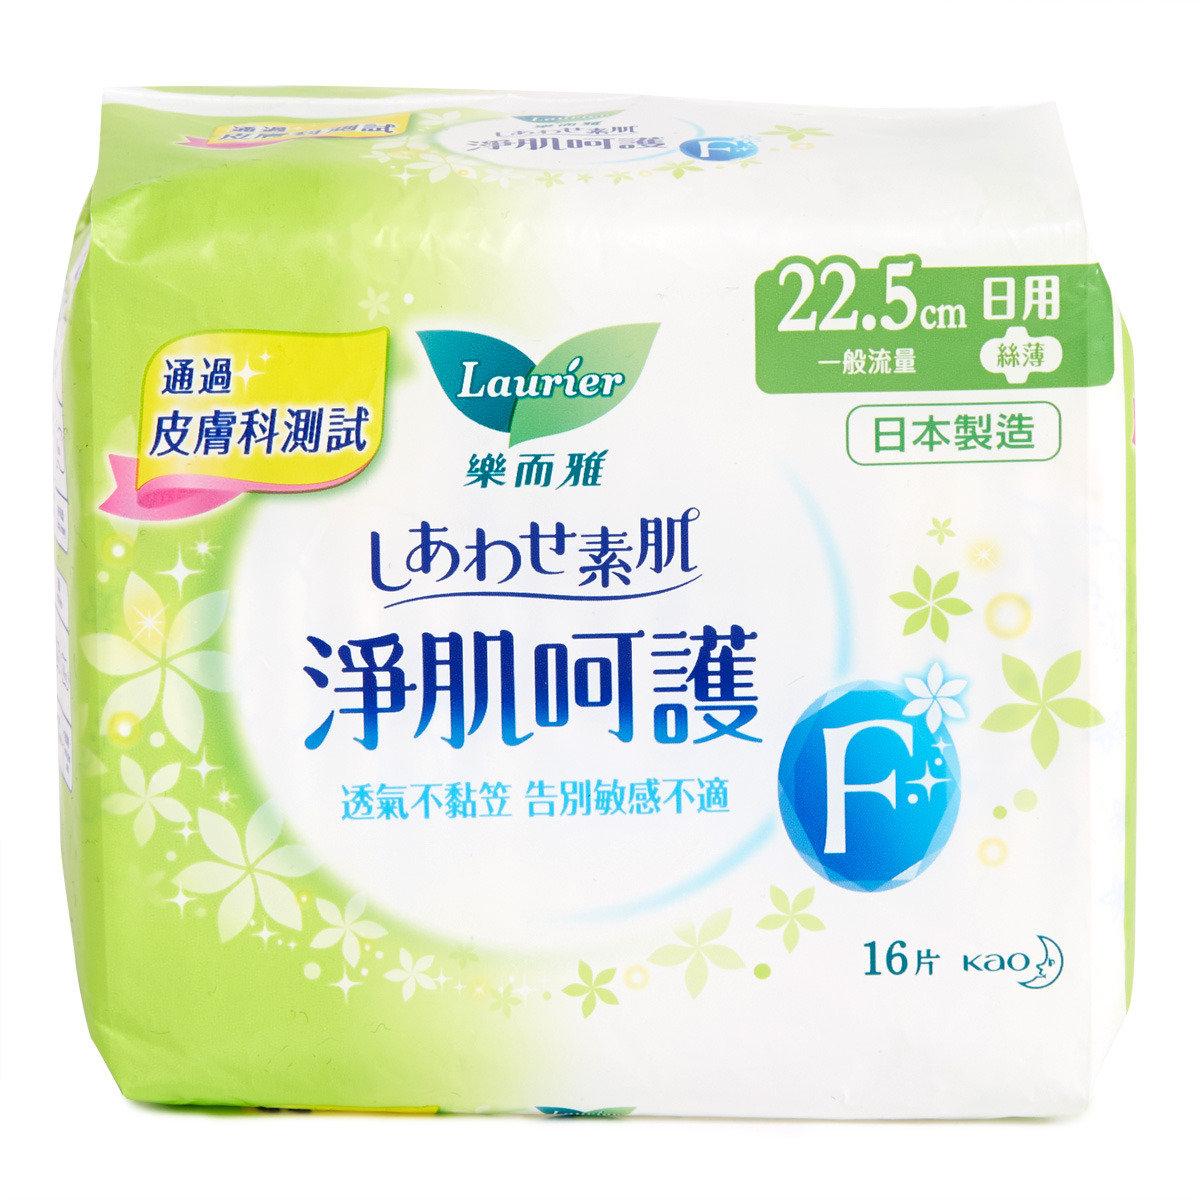 F絲薄日用安全翼衛生巾 22.5cm 16片裝